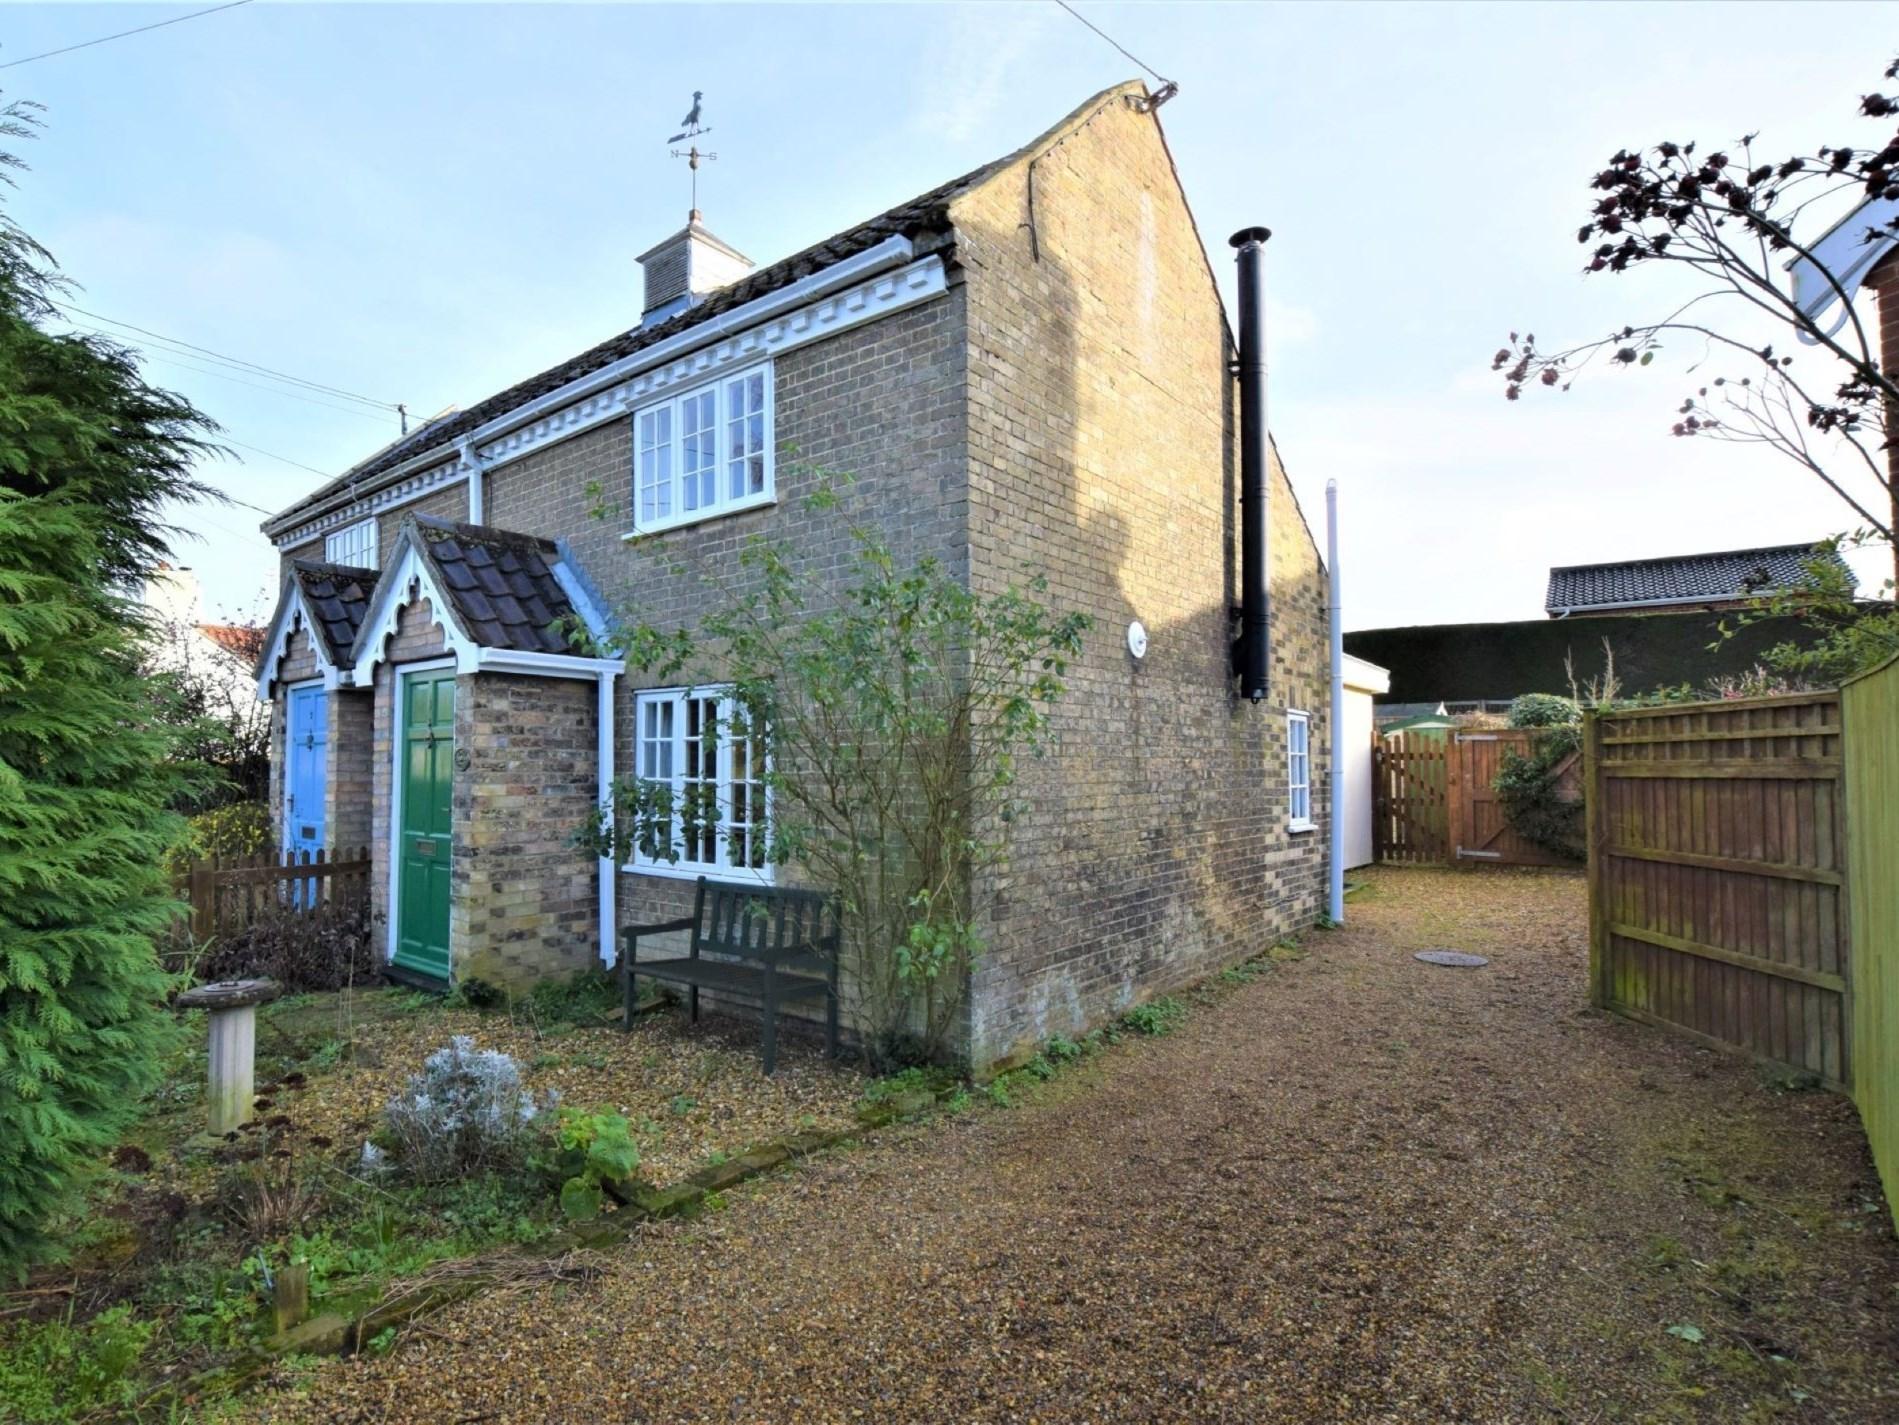 2 Bedroom Cottage in Saxmundham, East Anglia